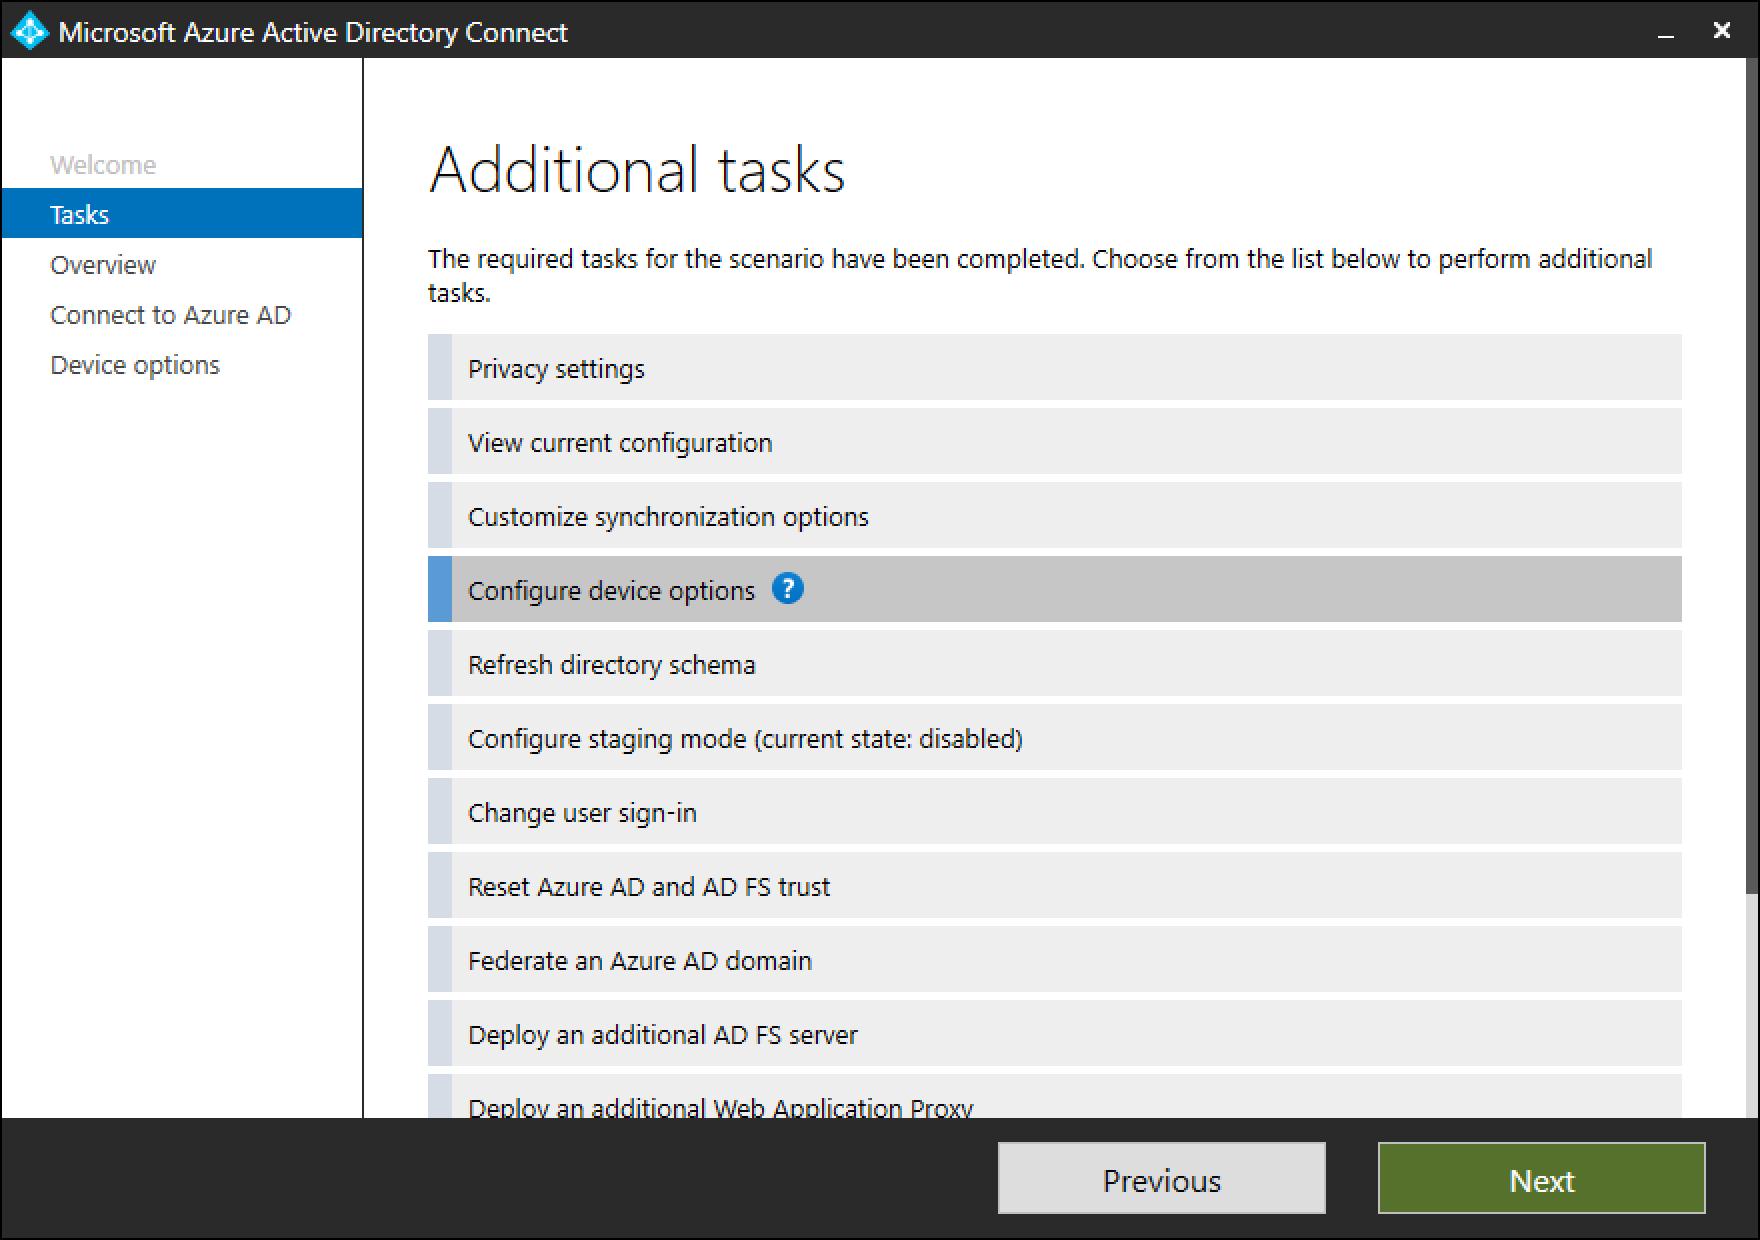 Azure AD Connect: Device options | Microsoft Docs